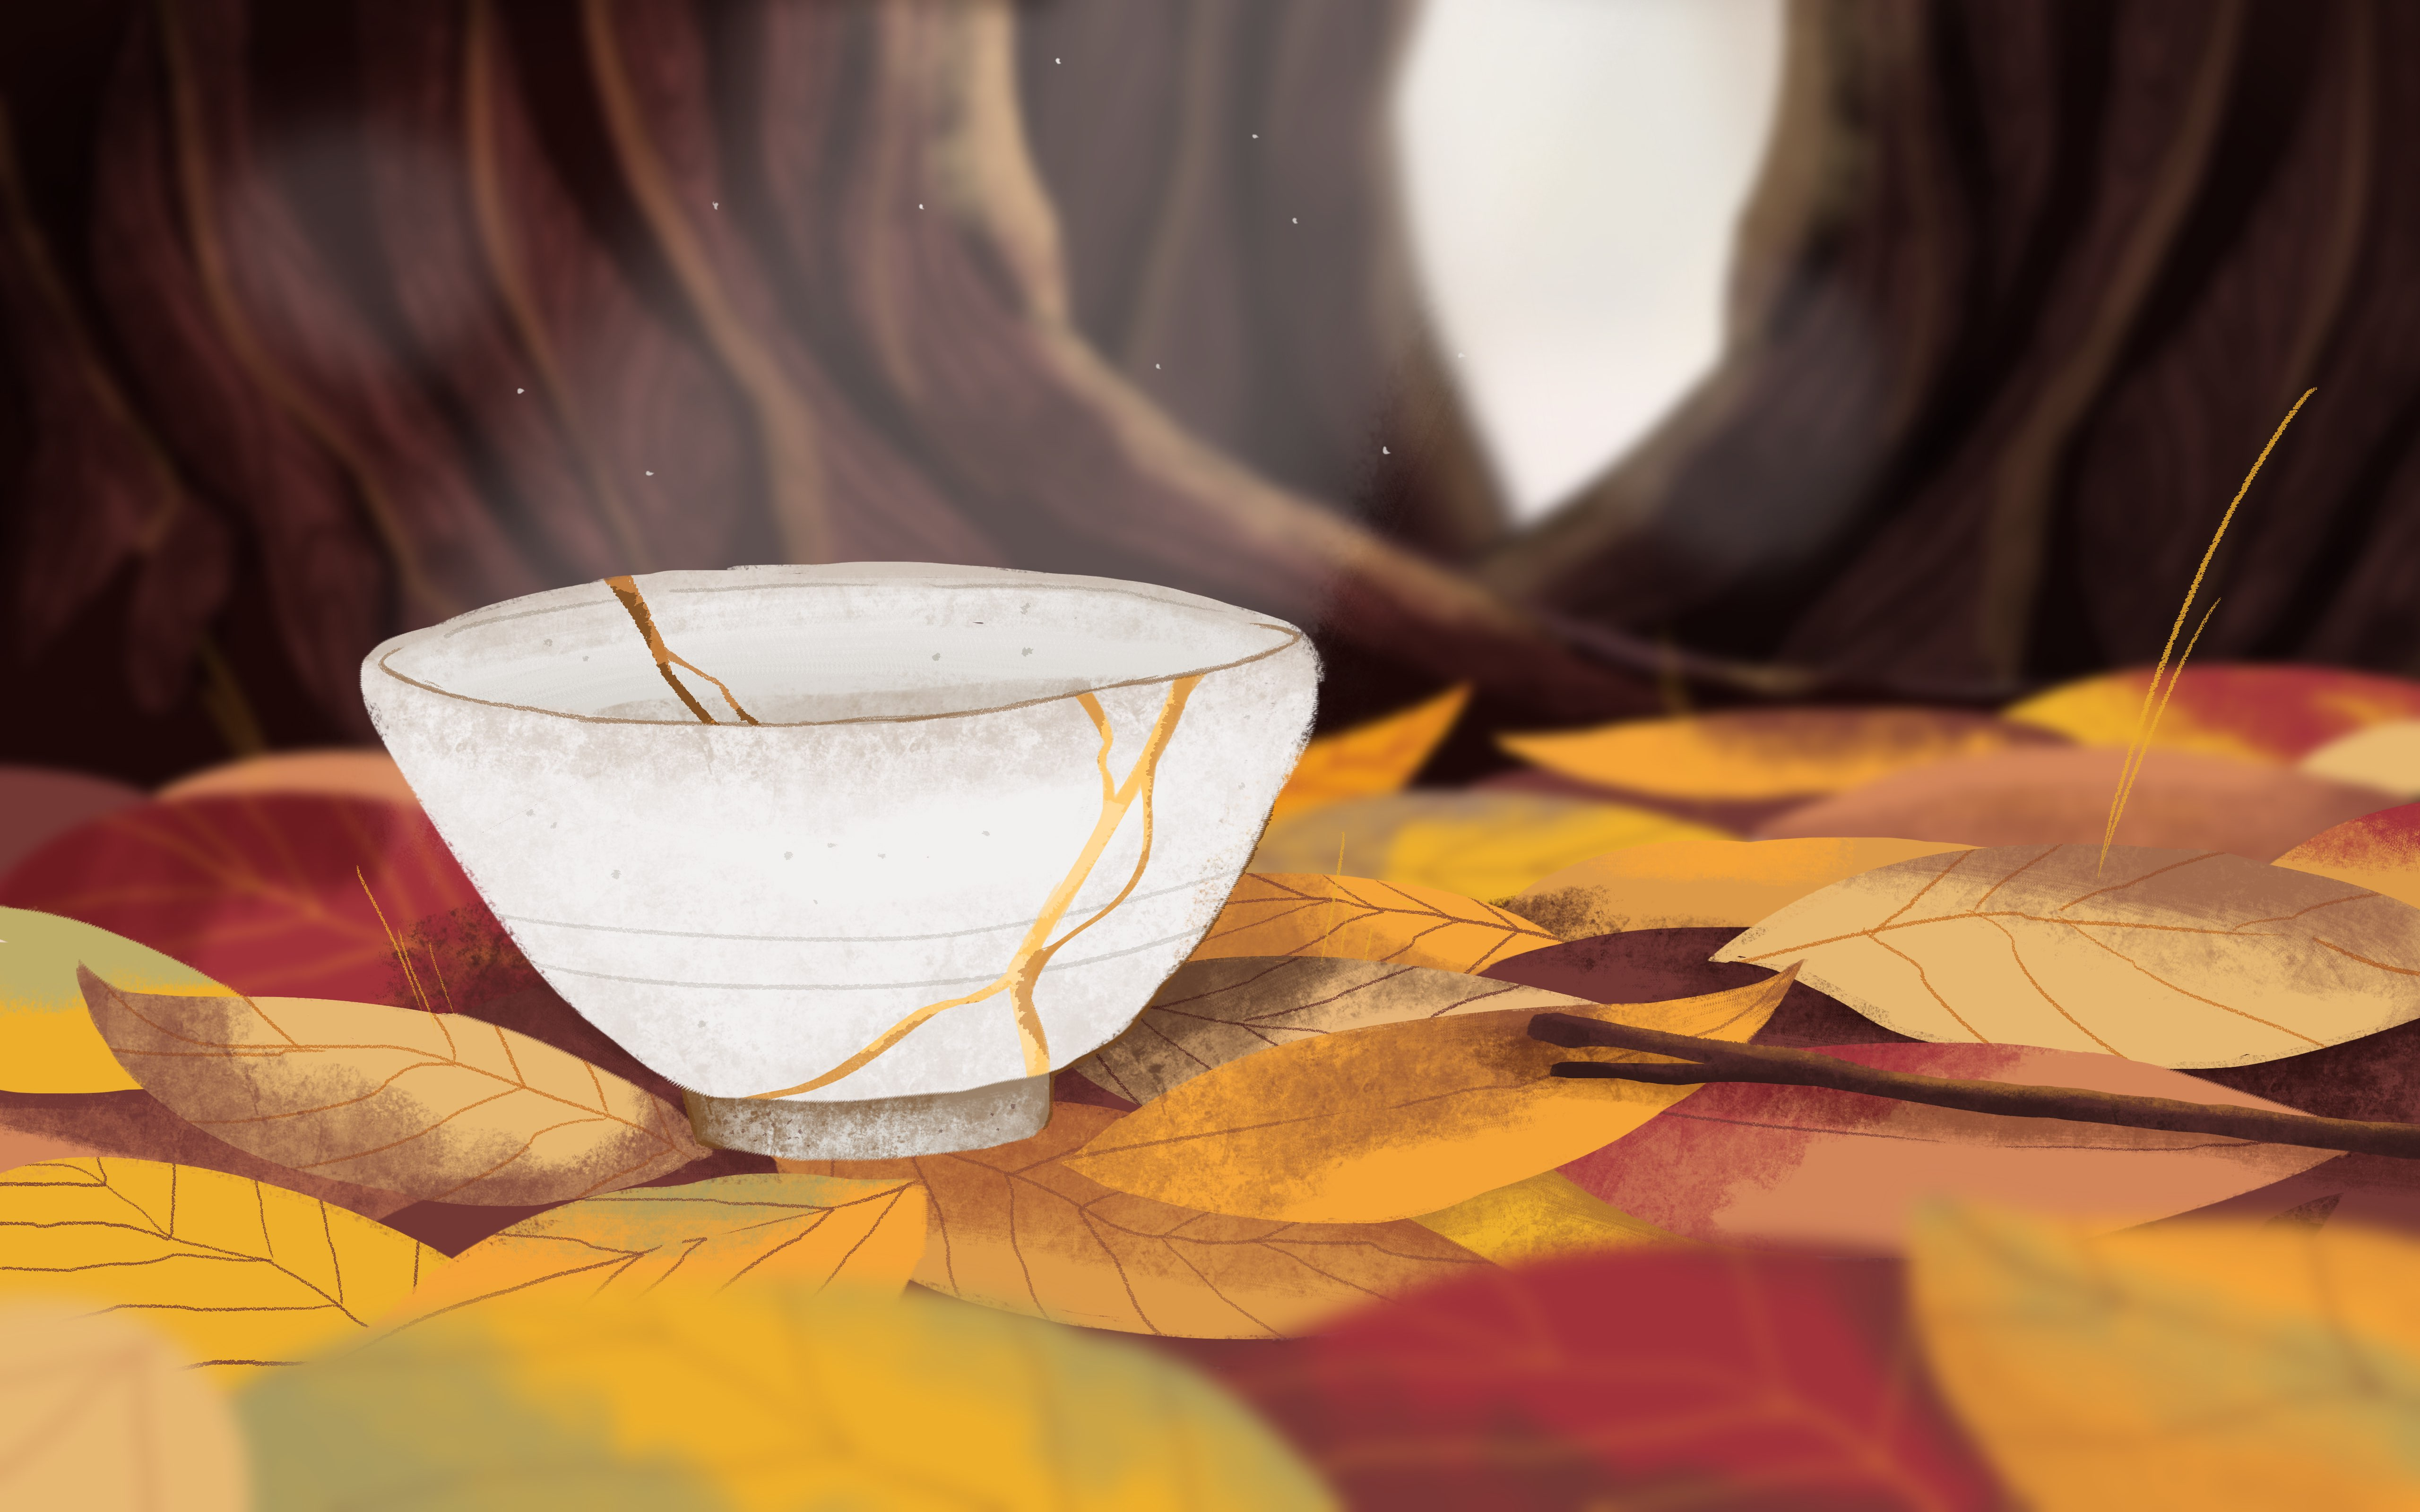 Western Wabi Sabi A Japanese Aesthetic as